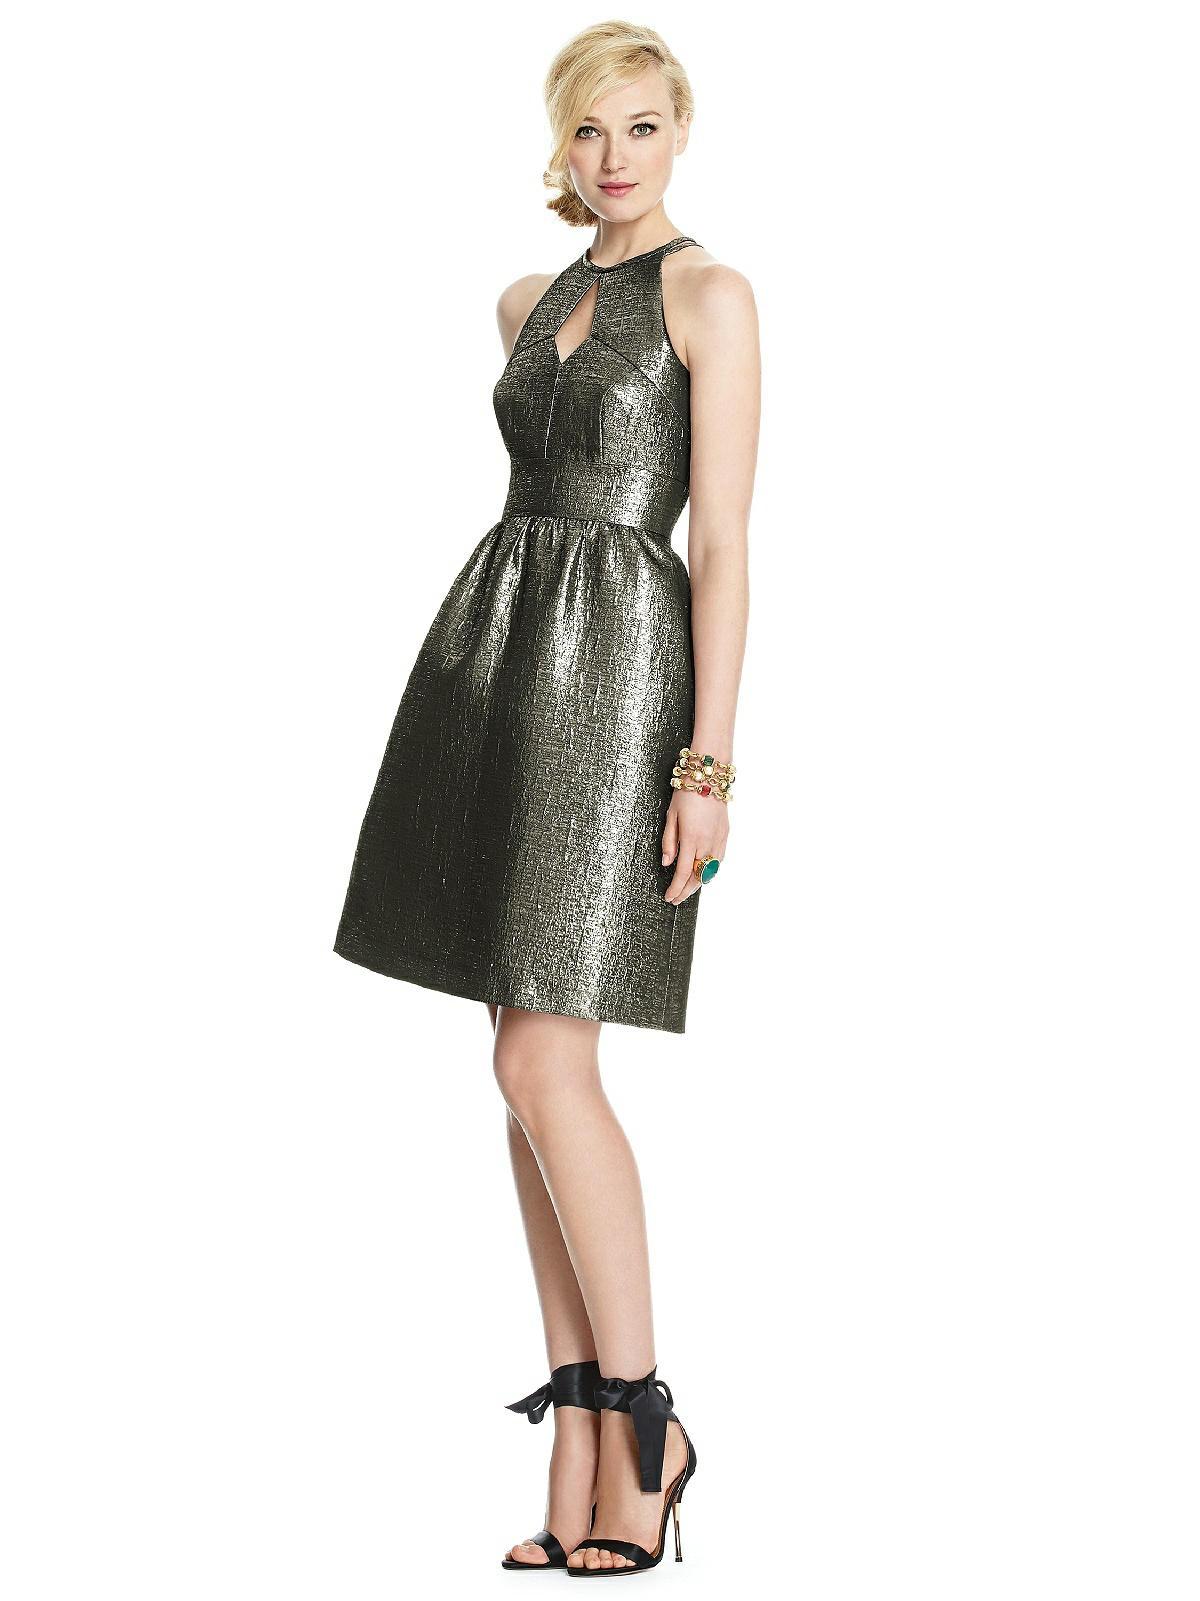 gold lame bridesmaid dress